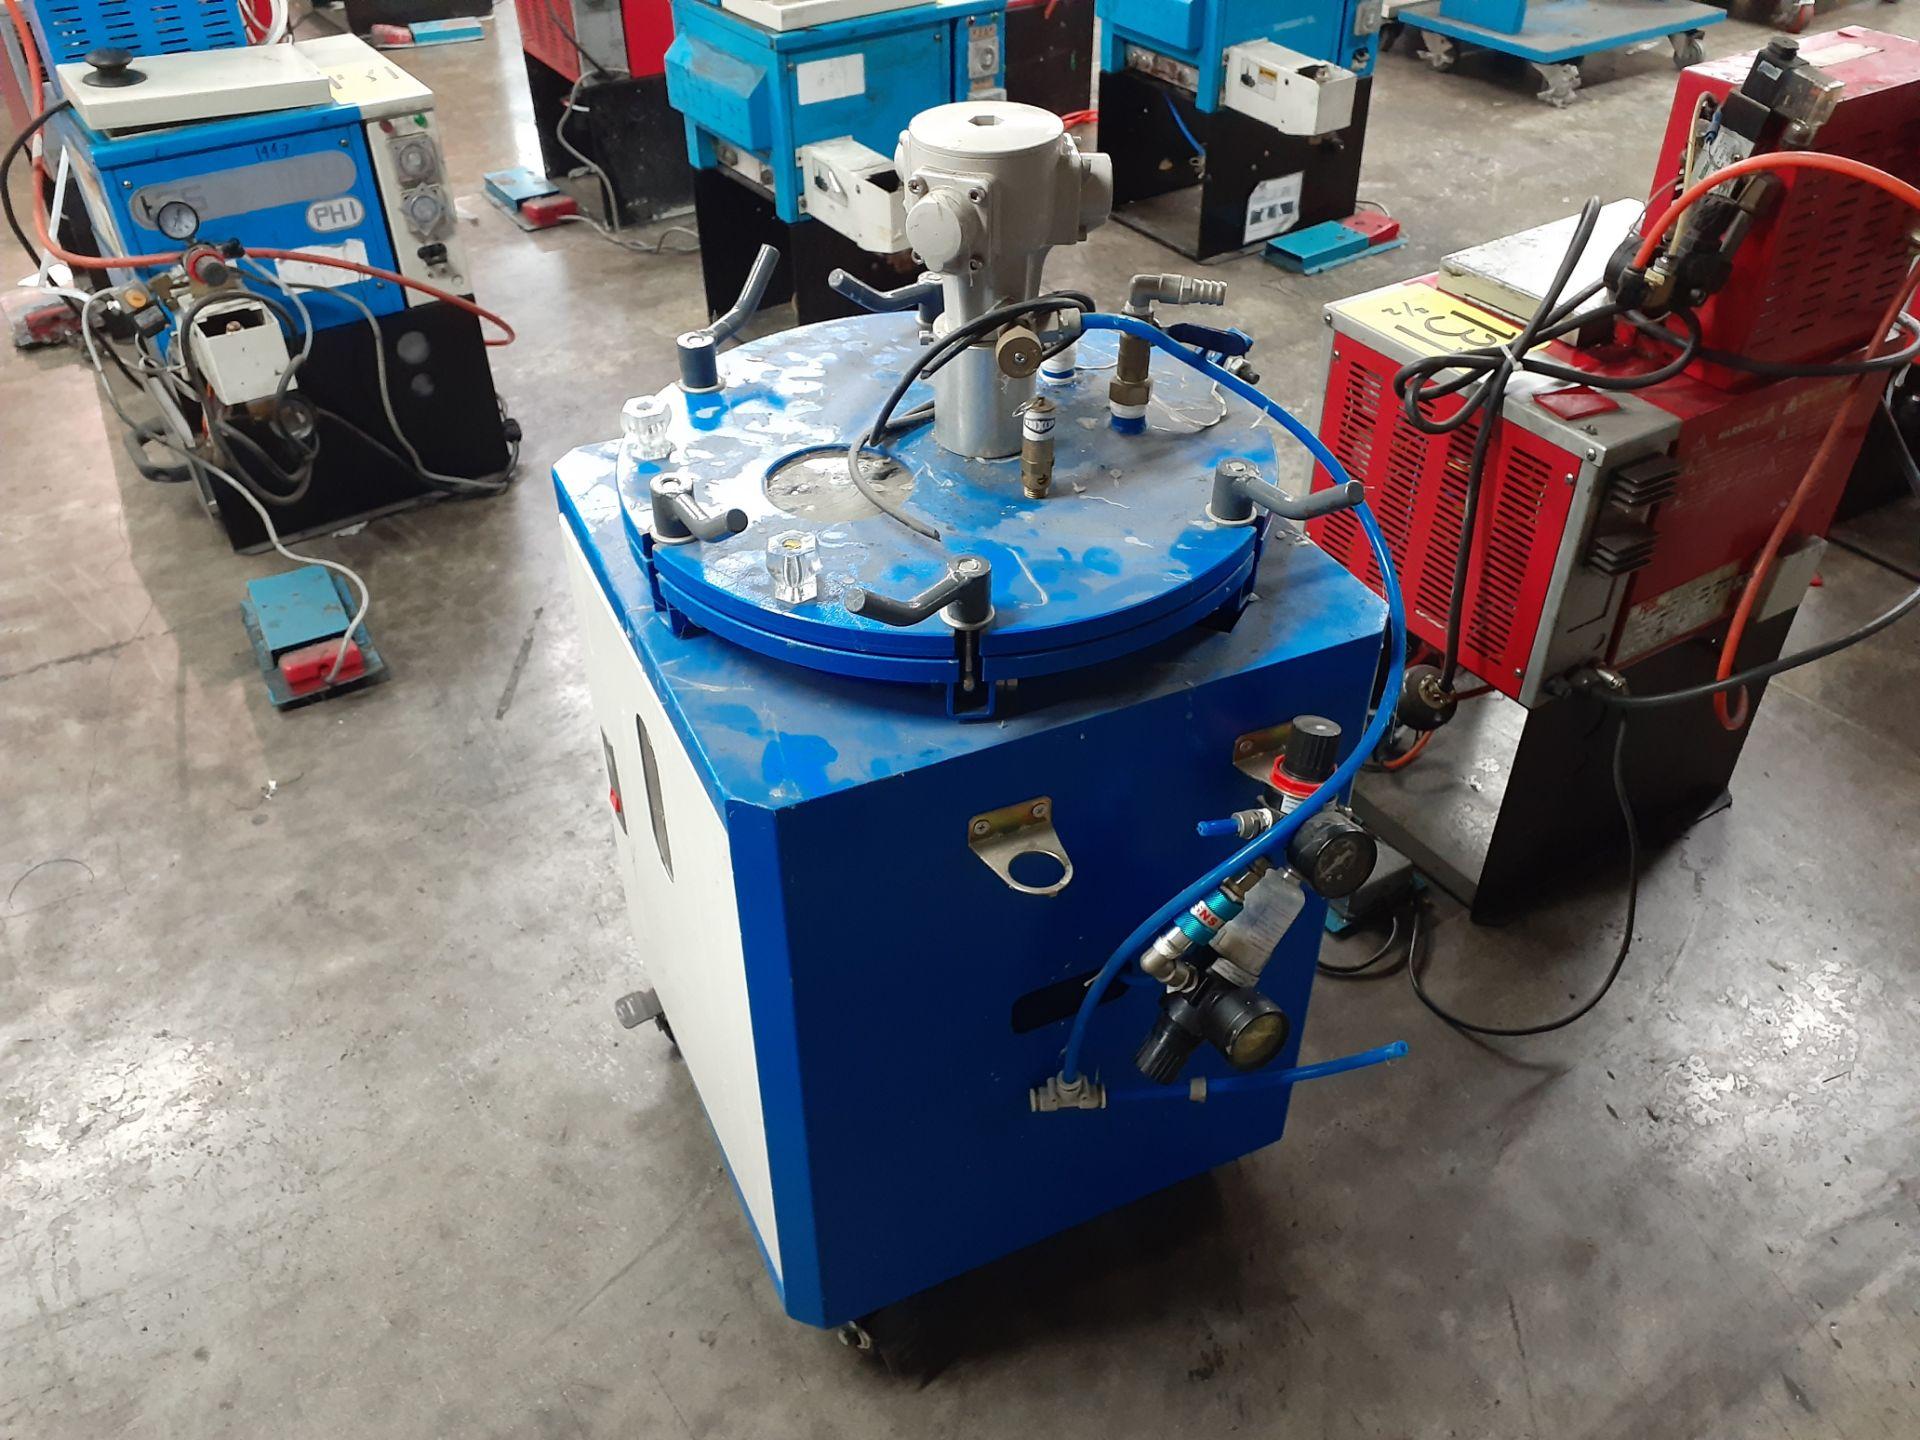 Lot 155 - Recipiente de alta presión para aplicación de líquidos de alta viscosidad marca Kaosen Enterprise